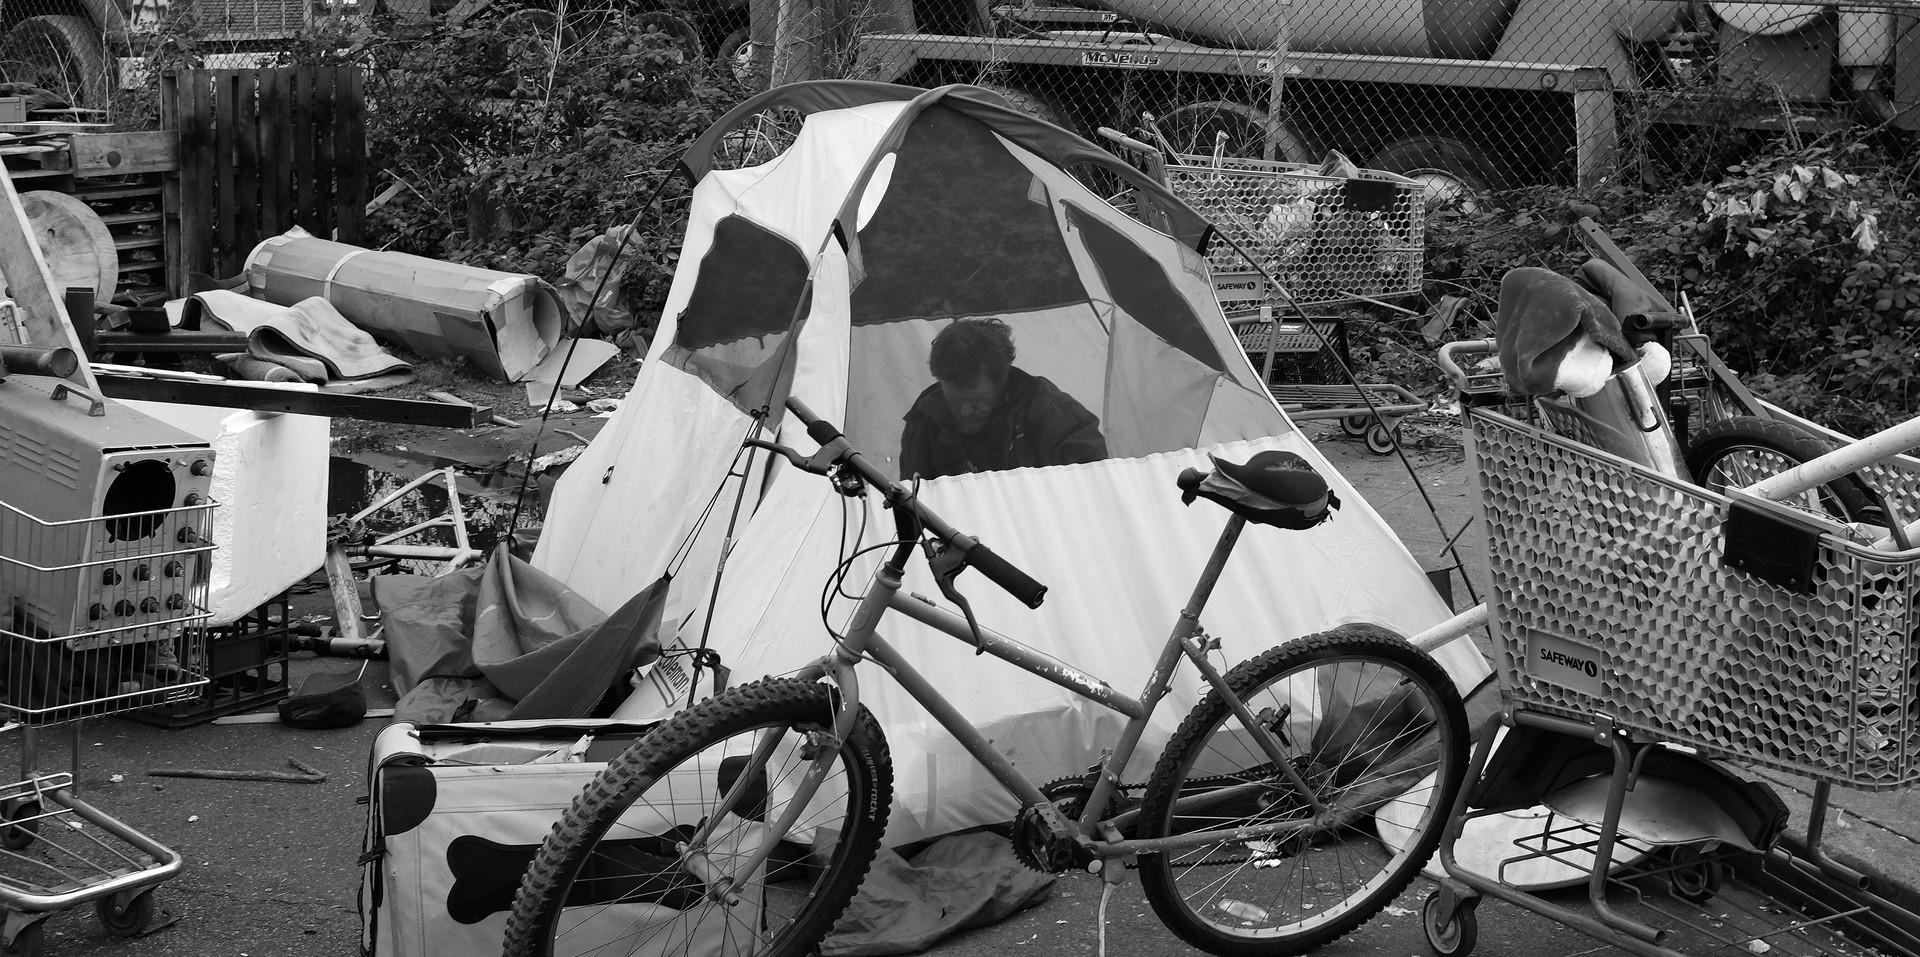 16_Man in Tent.jpg